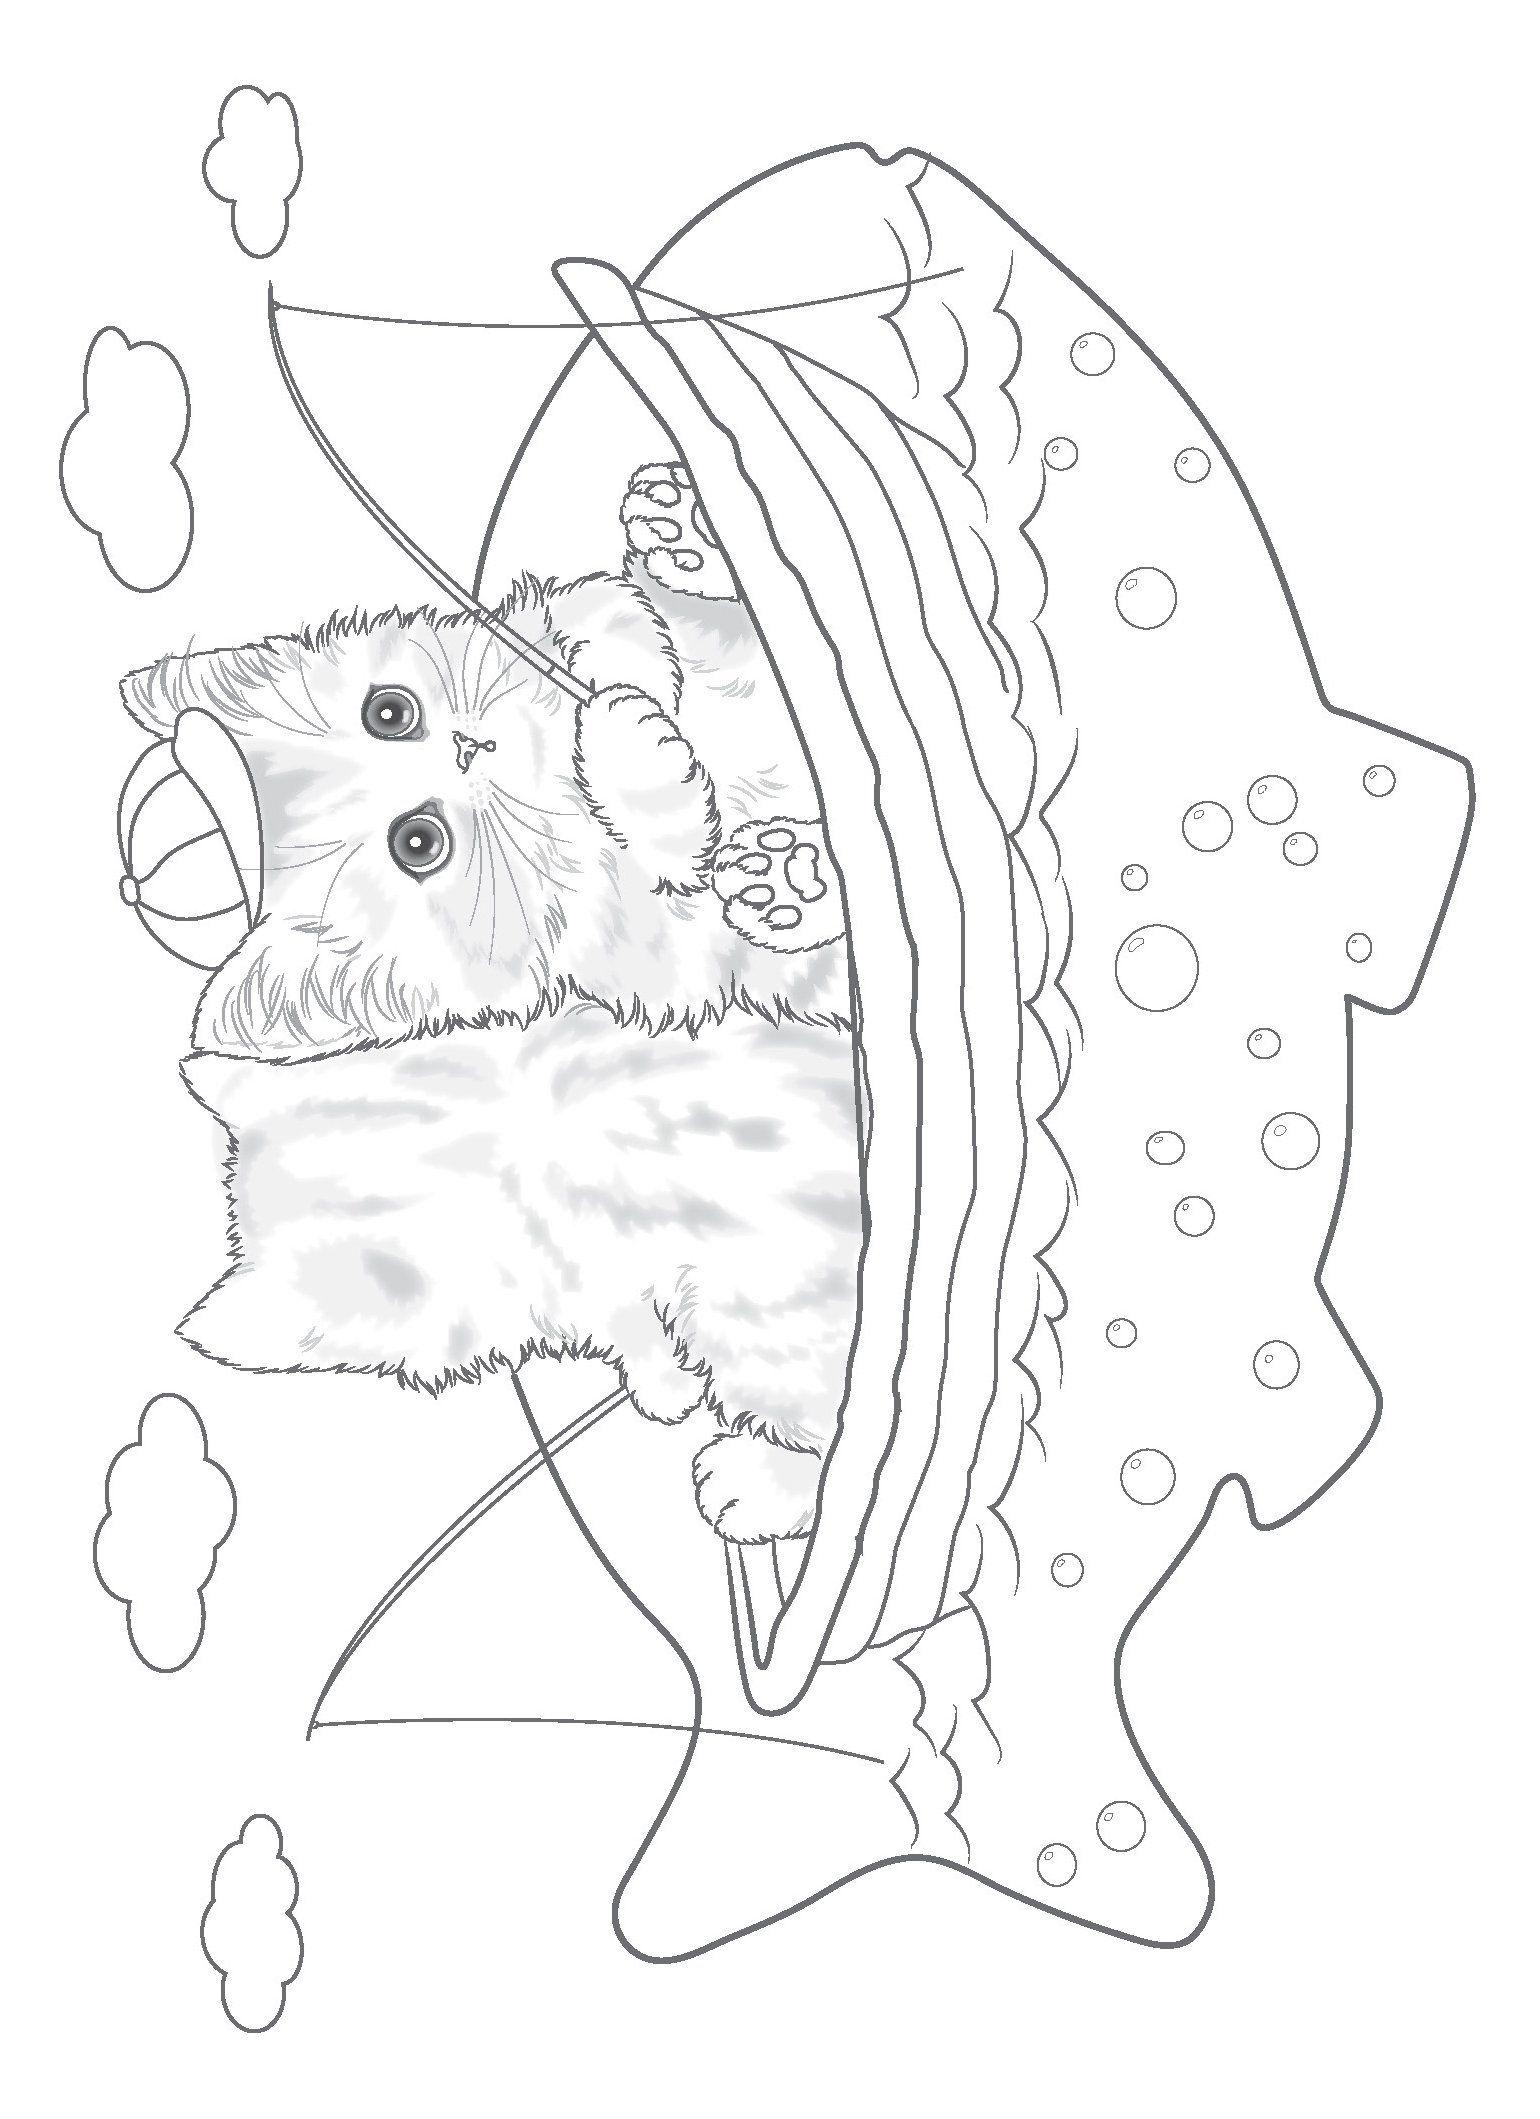 Teacup Kittens Coloring Book Colouring Books Amazon De Kayomi Harai Fremdsprachige Bucher Kitten Coloring Book Cute Coloring Pages Cat Coloring Book